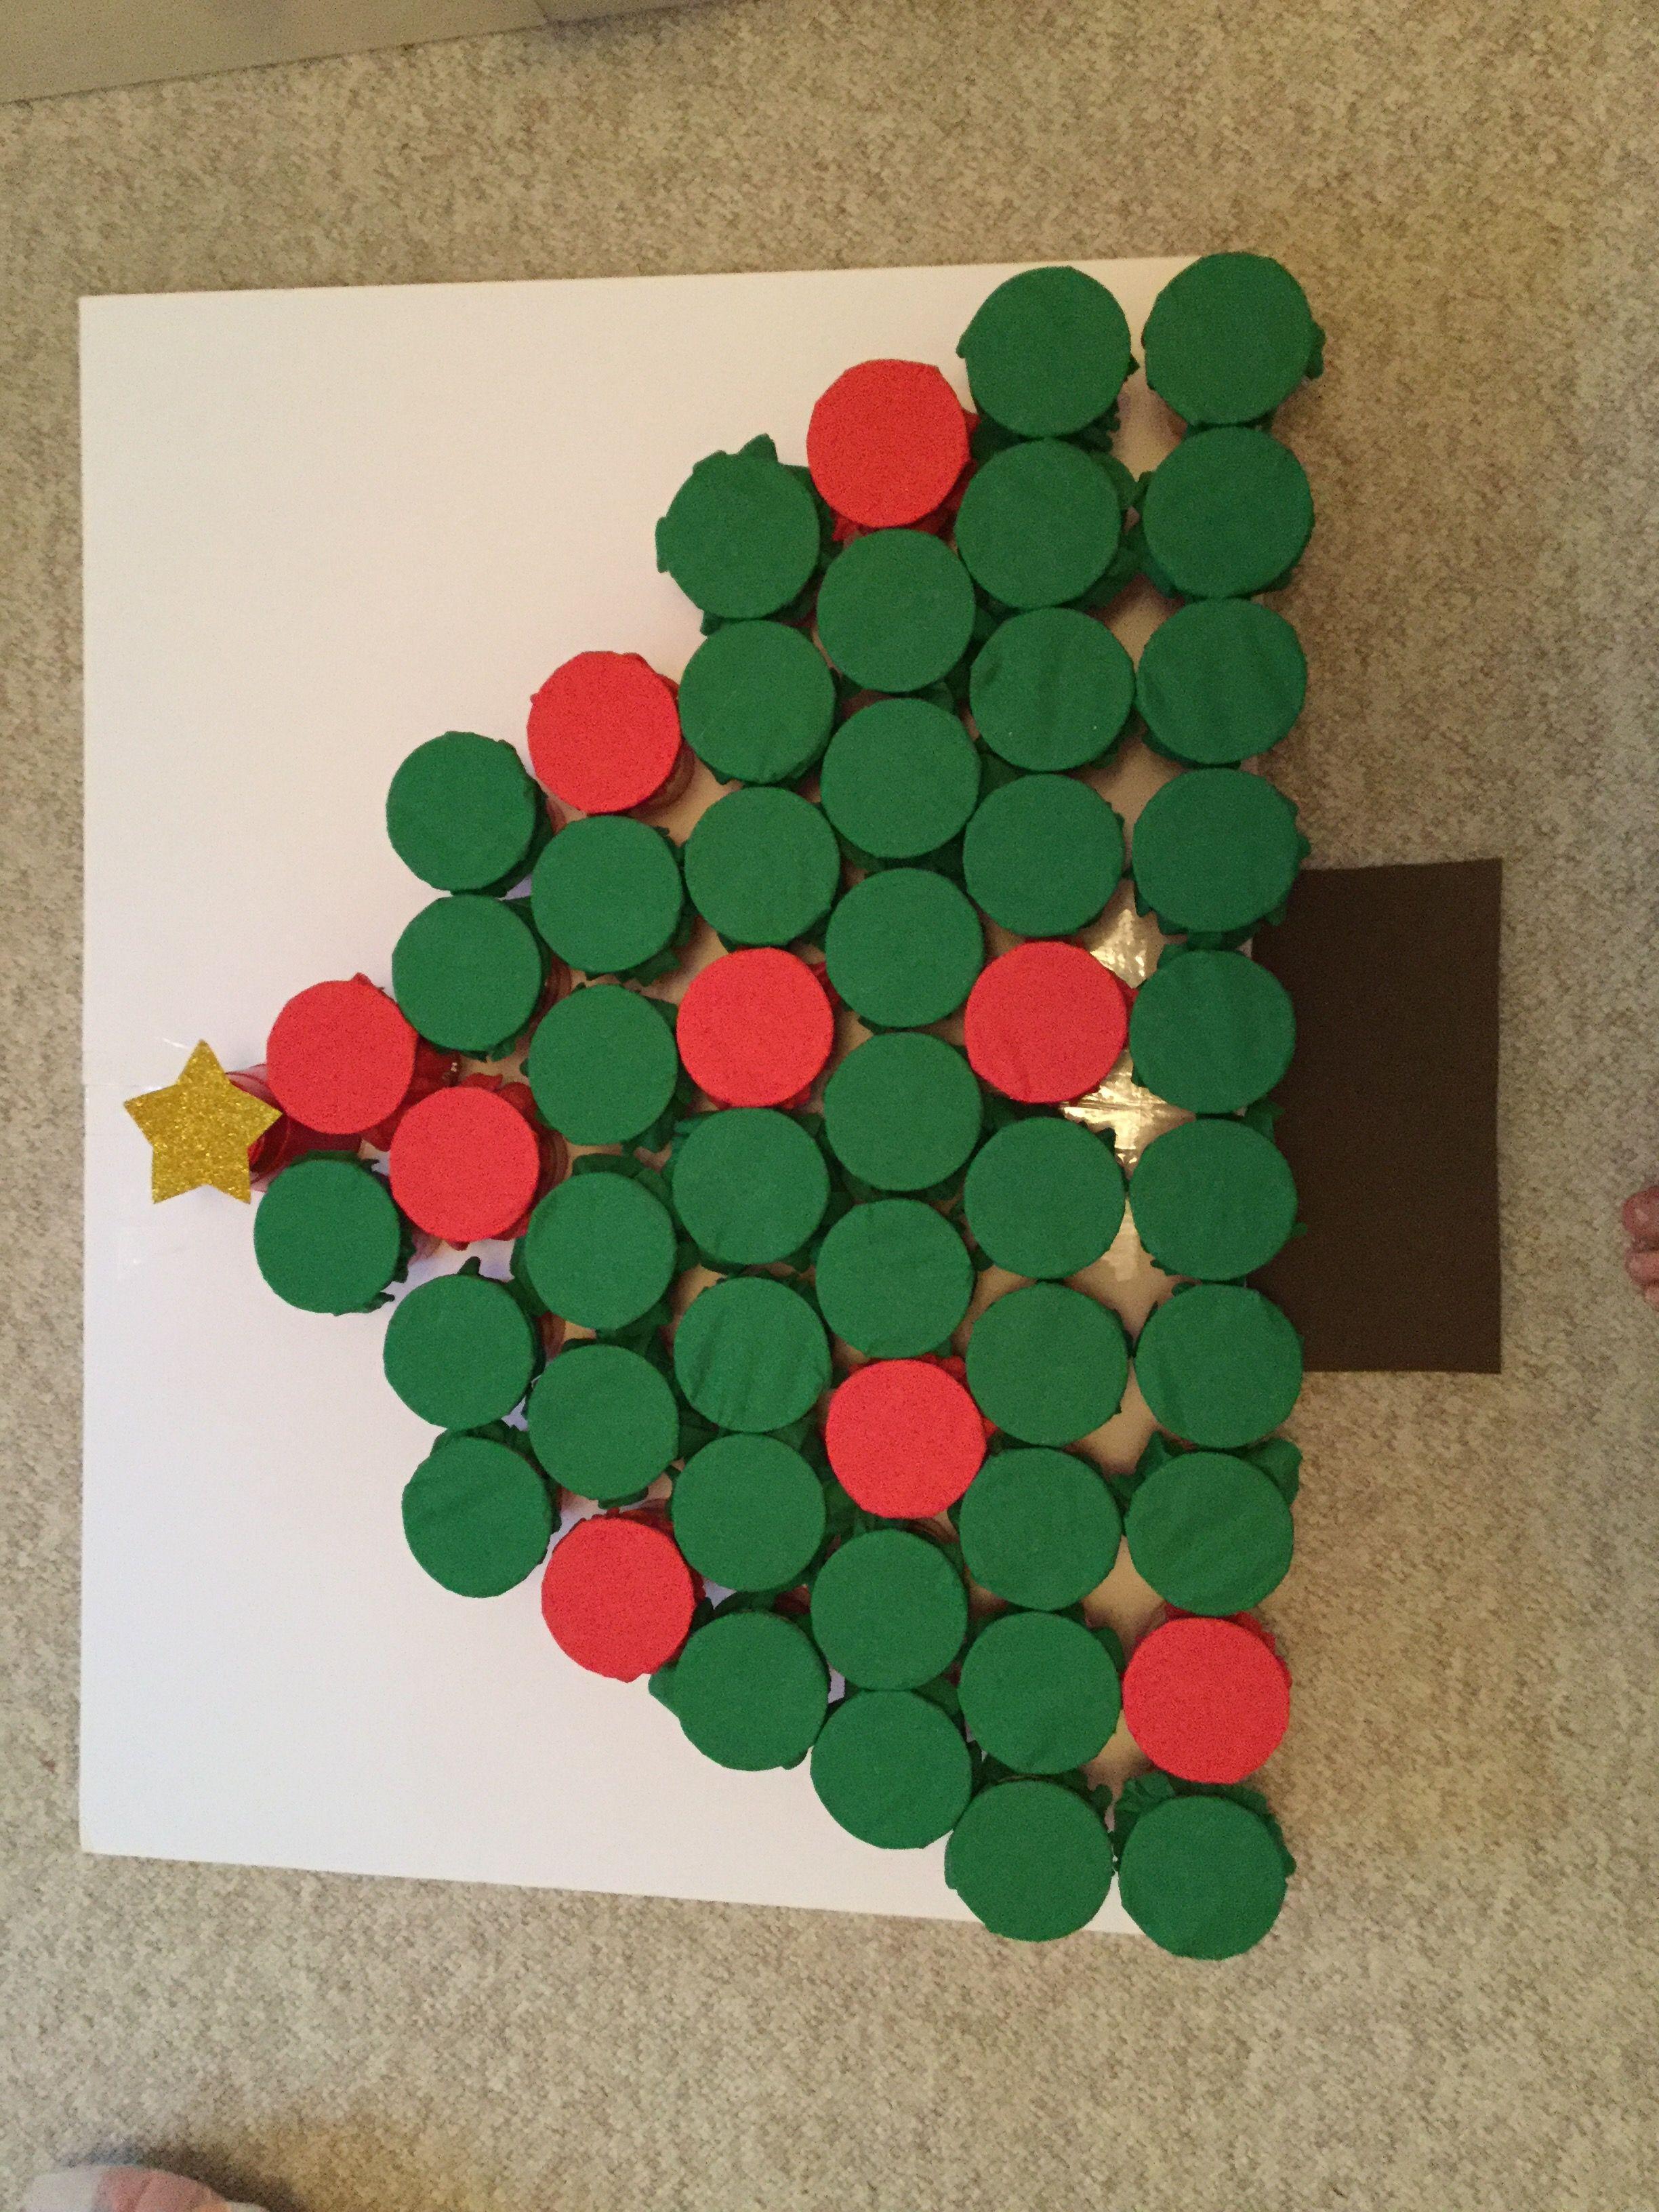 PokeATree Game Christmas tree skirt, Holiday decor